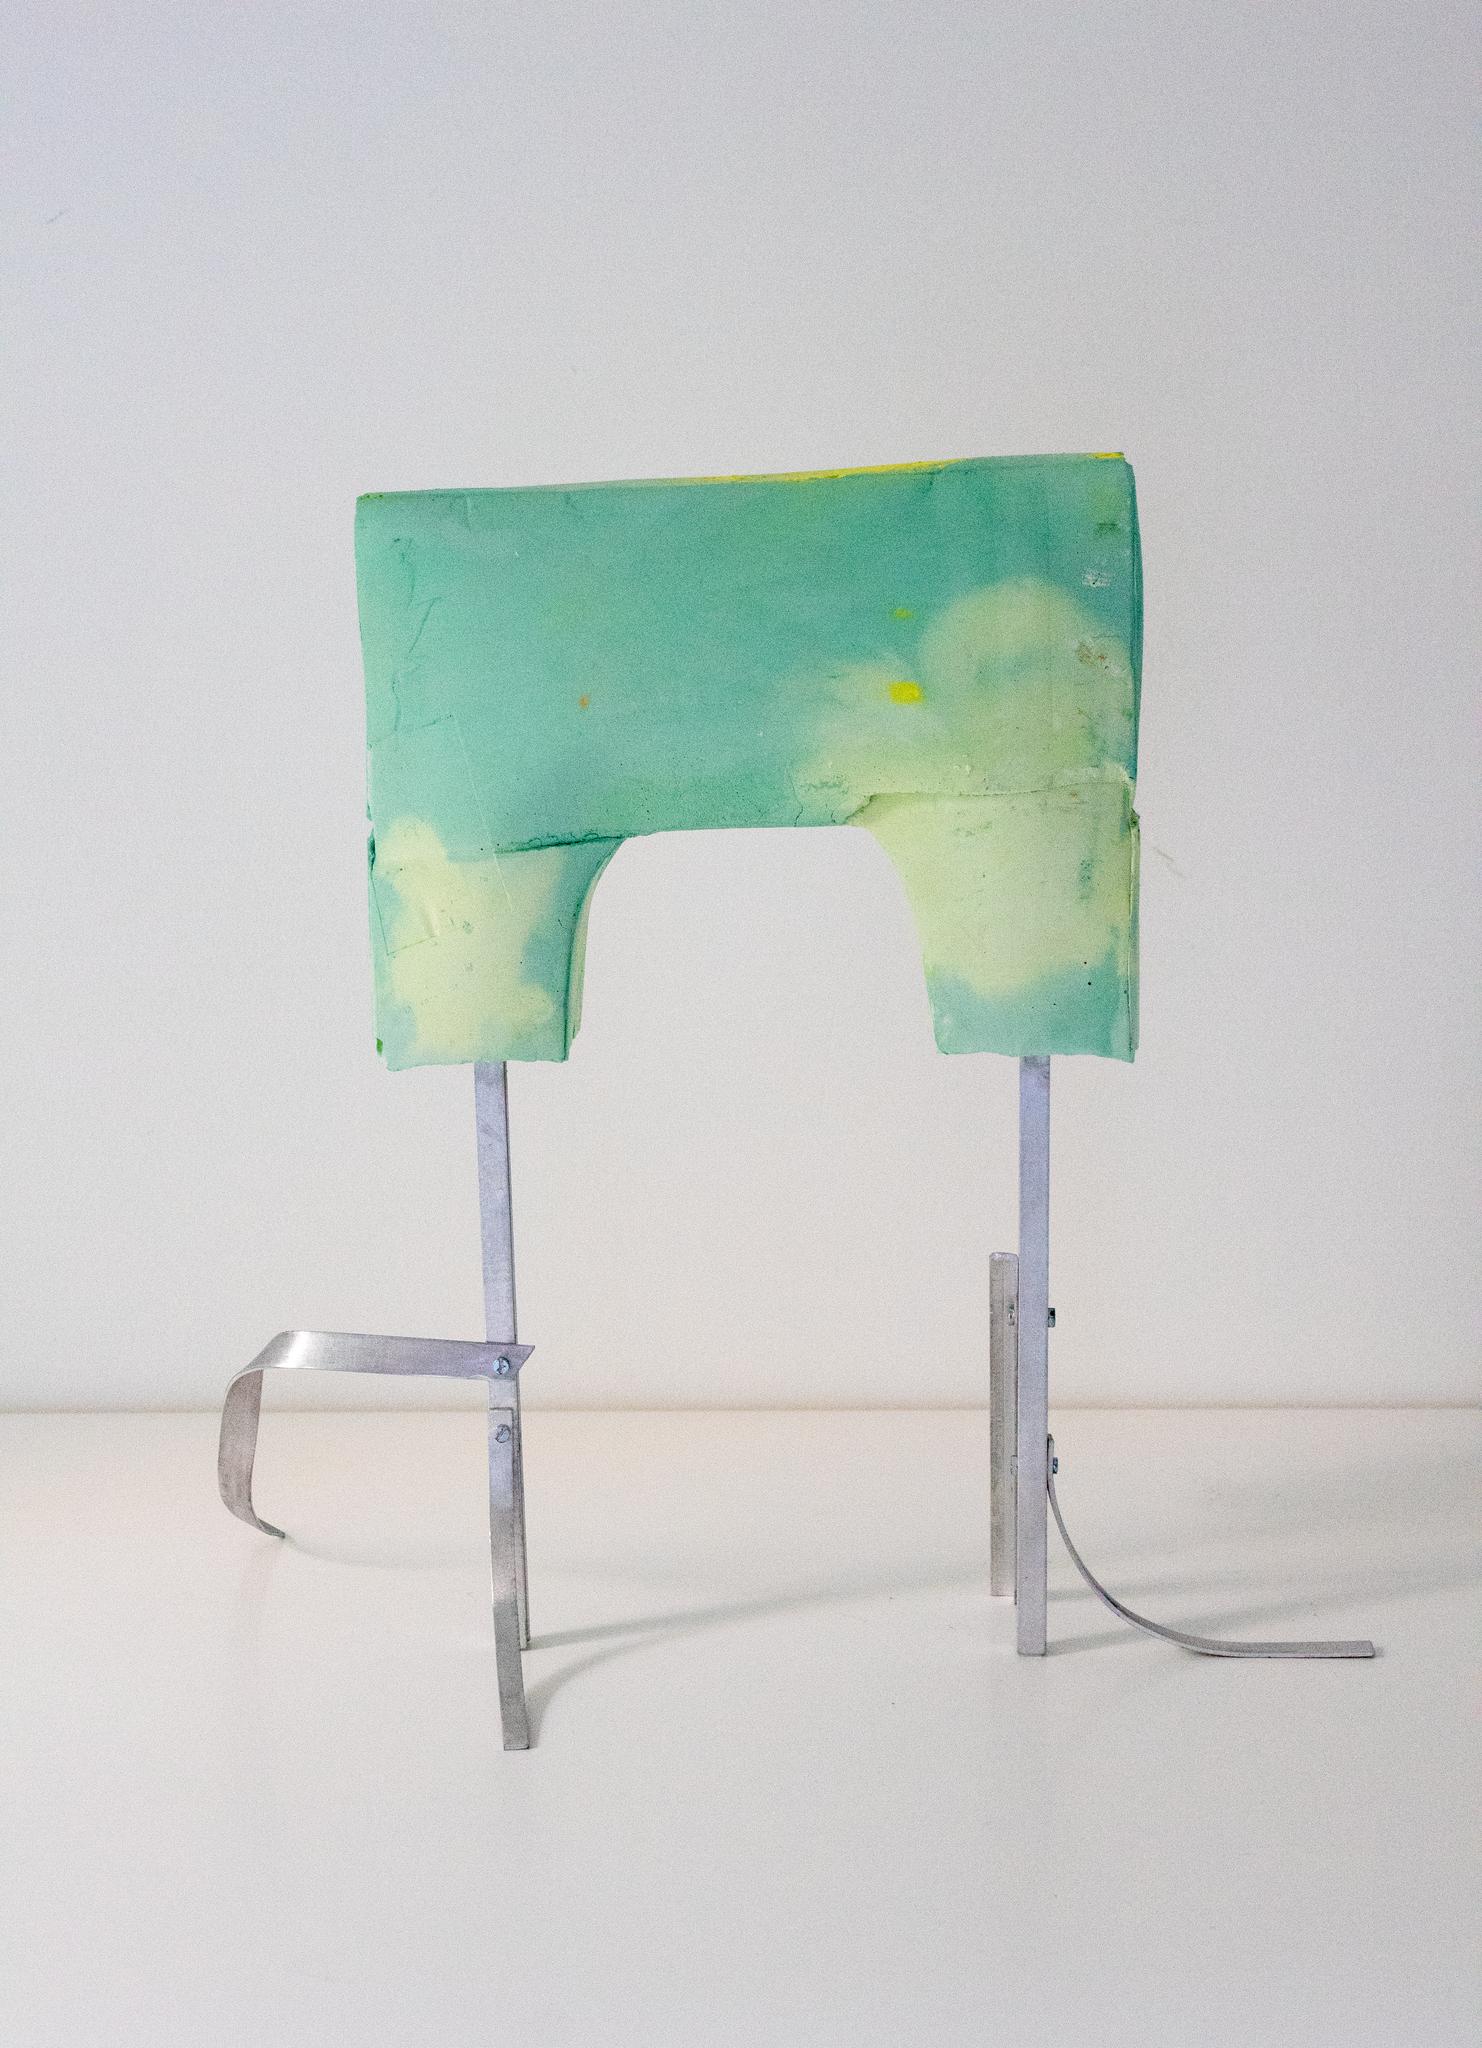 Formschnitt Nr.1_Betonguss, Pigment, Aluminium_31 x 32 x 17 cm_2018